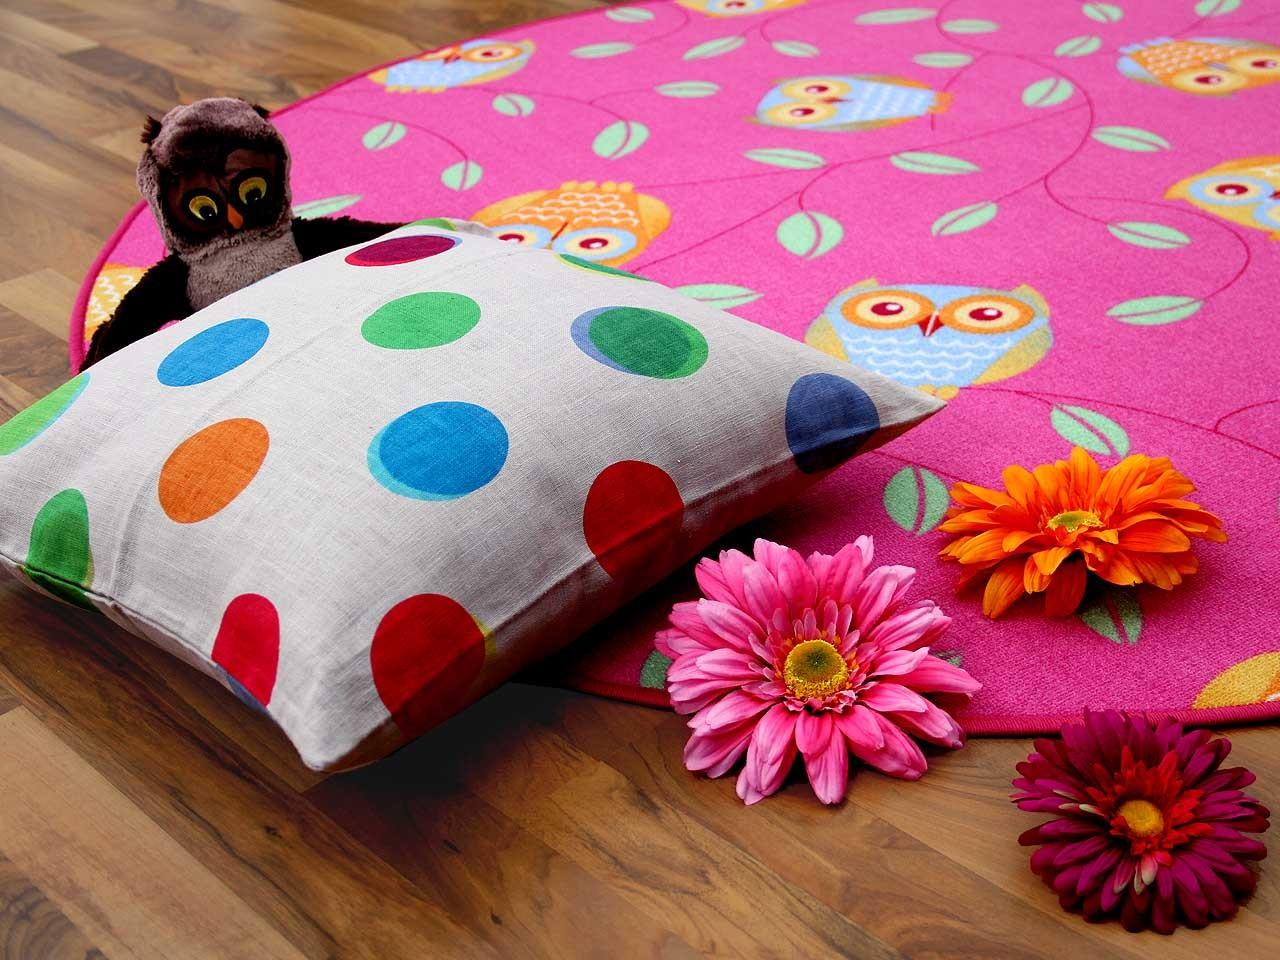 kinder spielteppich eule pink rund in 7 gr en teppiche kinder und spielteppiche snapstyle. Black Bedroom Furniture Sets. Home Design Ideas